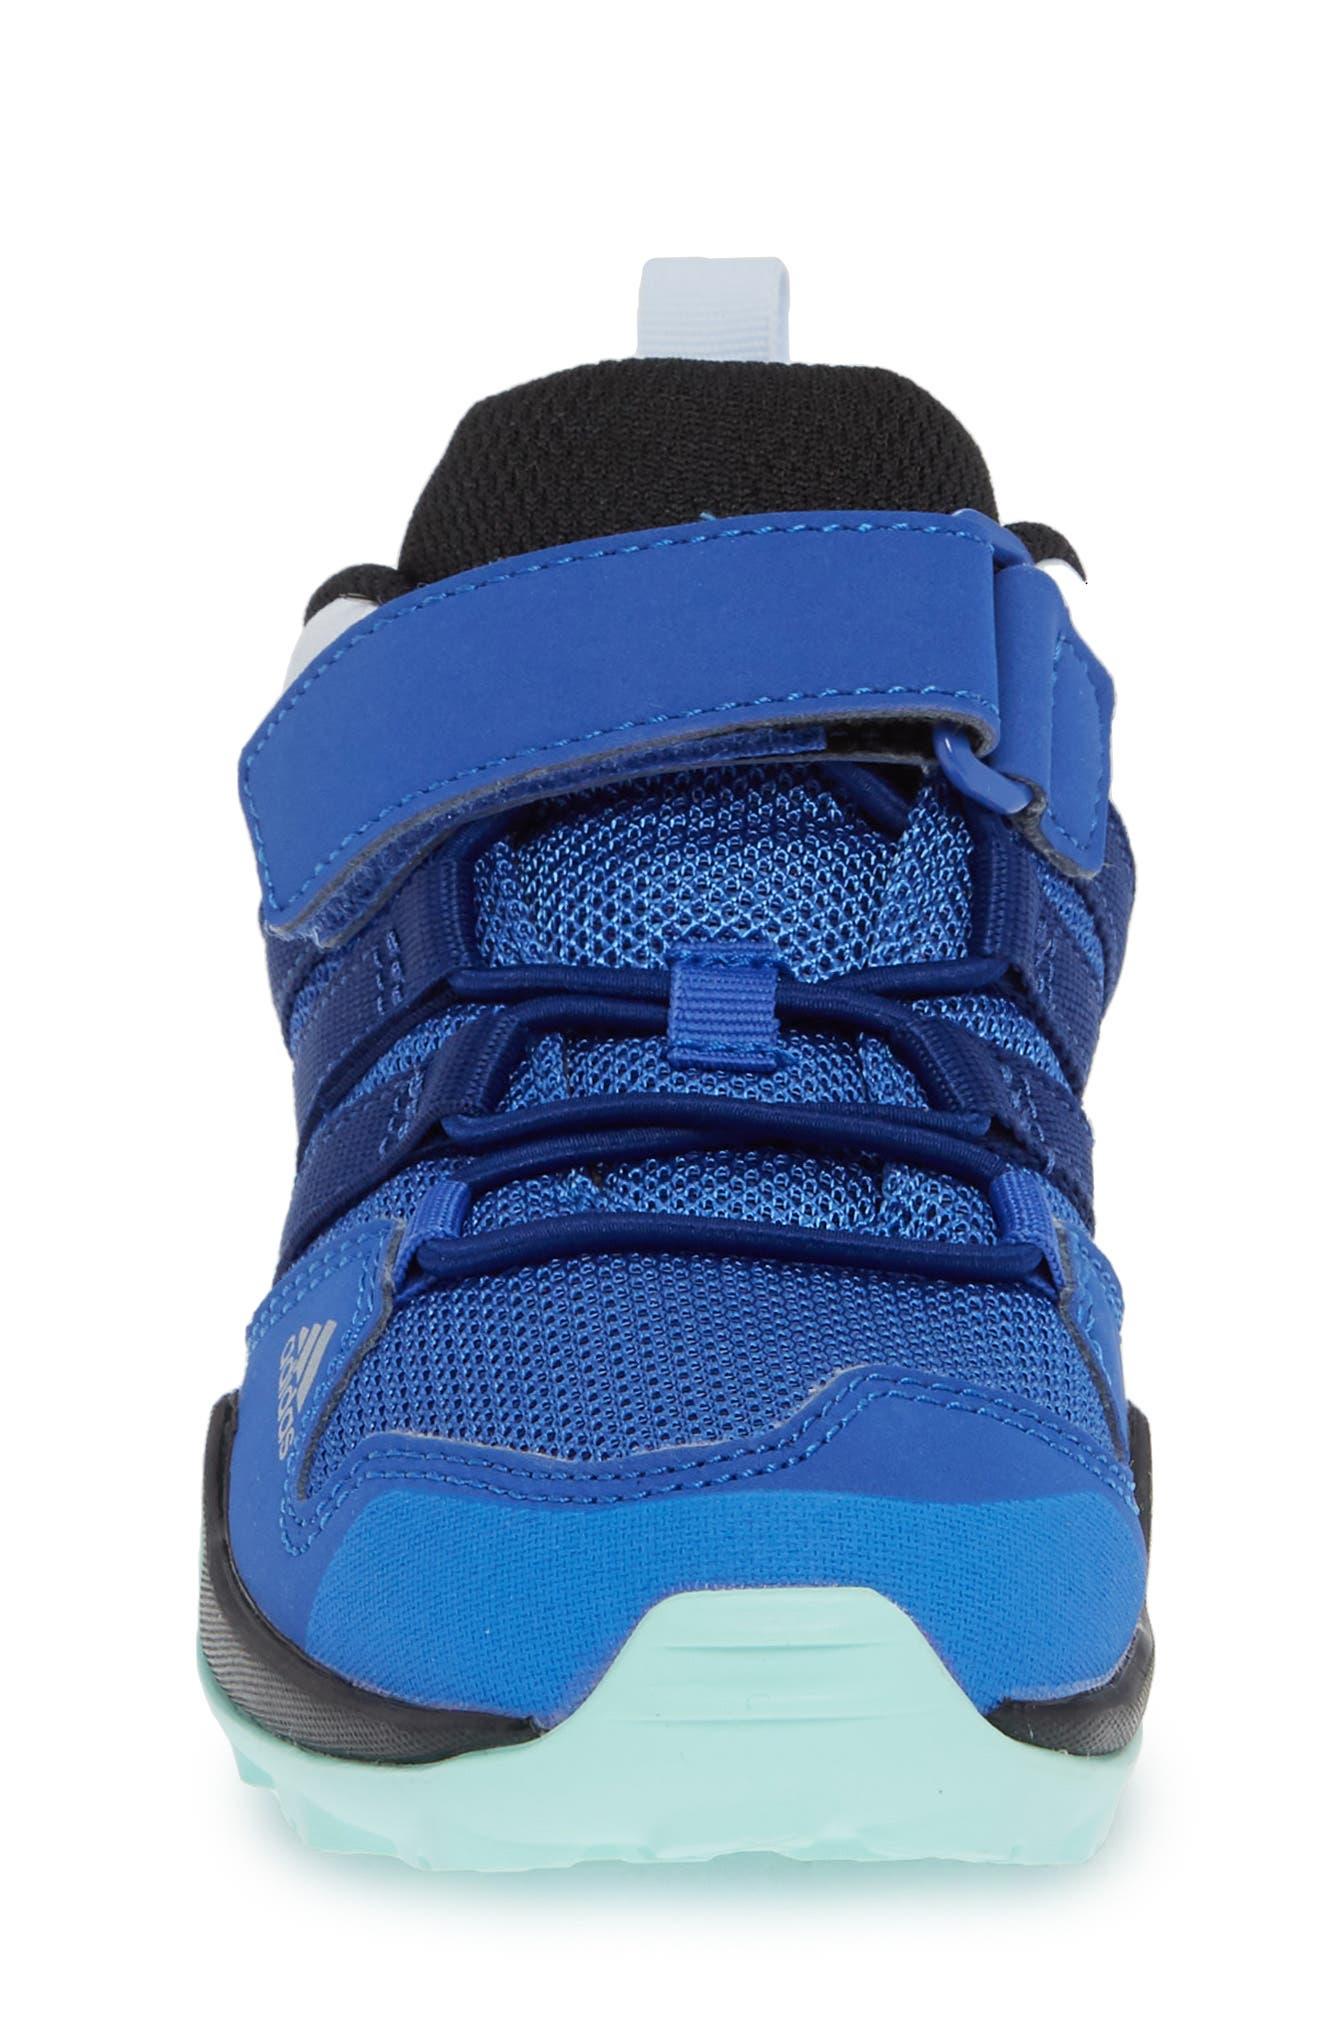 Terrex AX2R Sneaker,                             Alternate thumbnail 4, color,                             HI-RES BLUE/ MYSTERY INK/ MINT